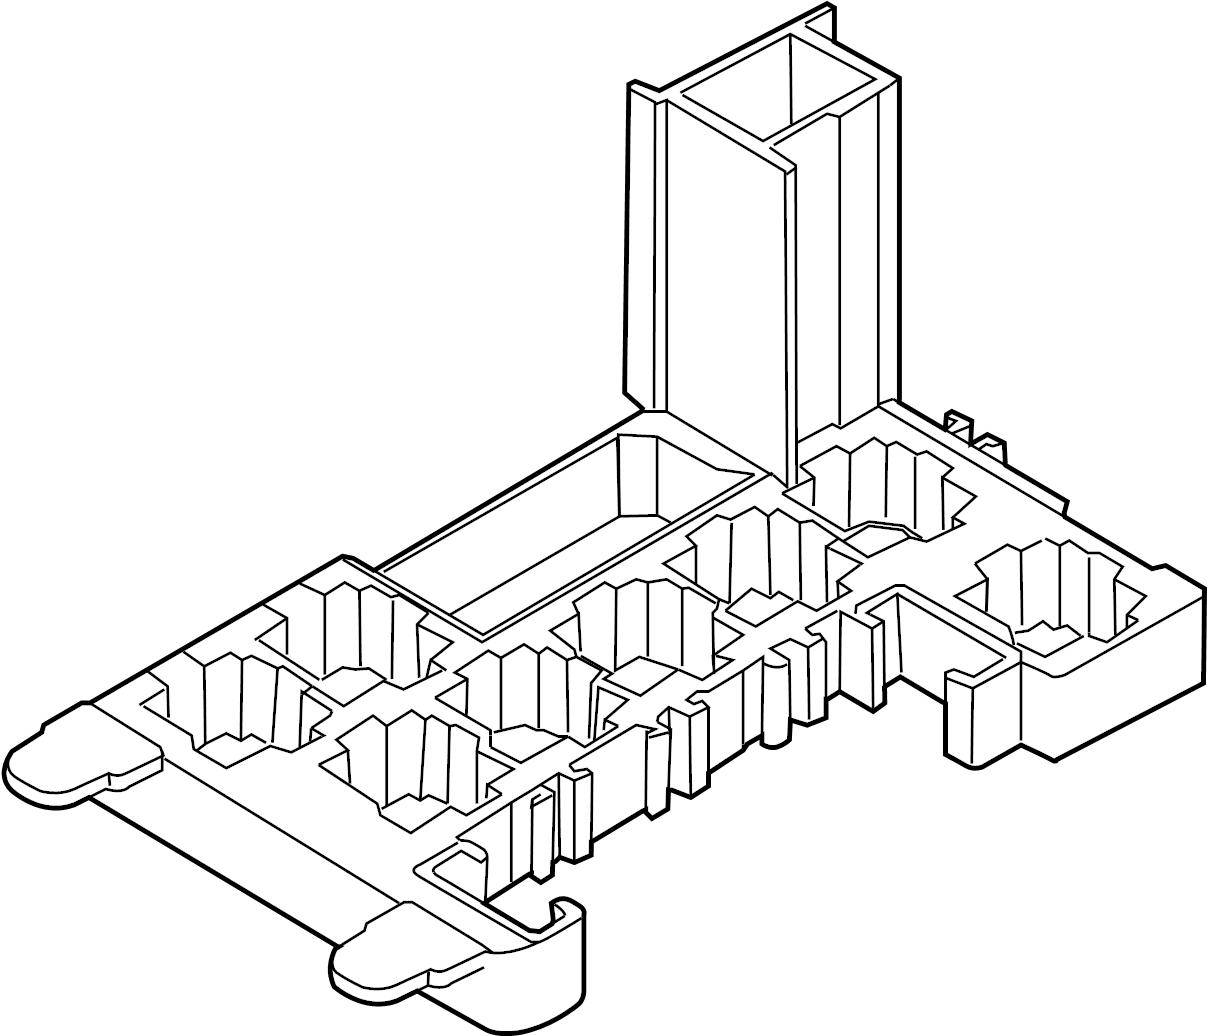 2003 chevy ke controller wiring diagram